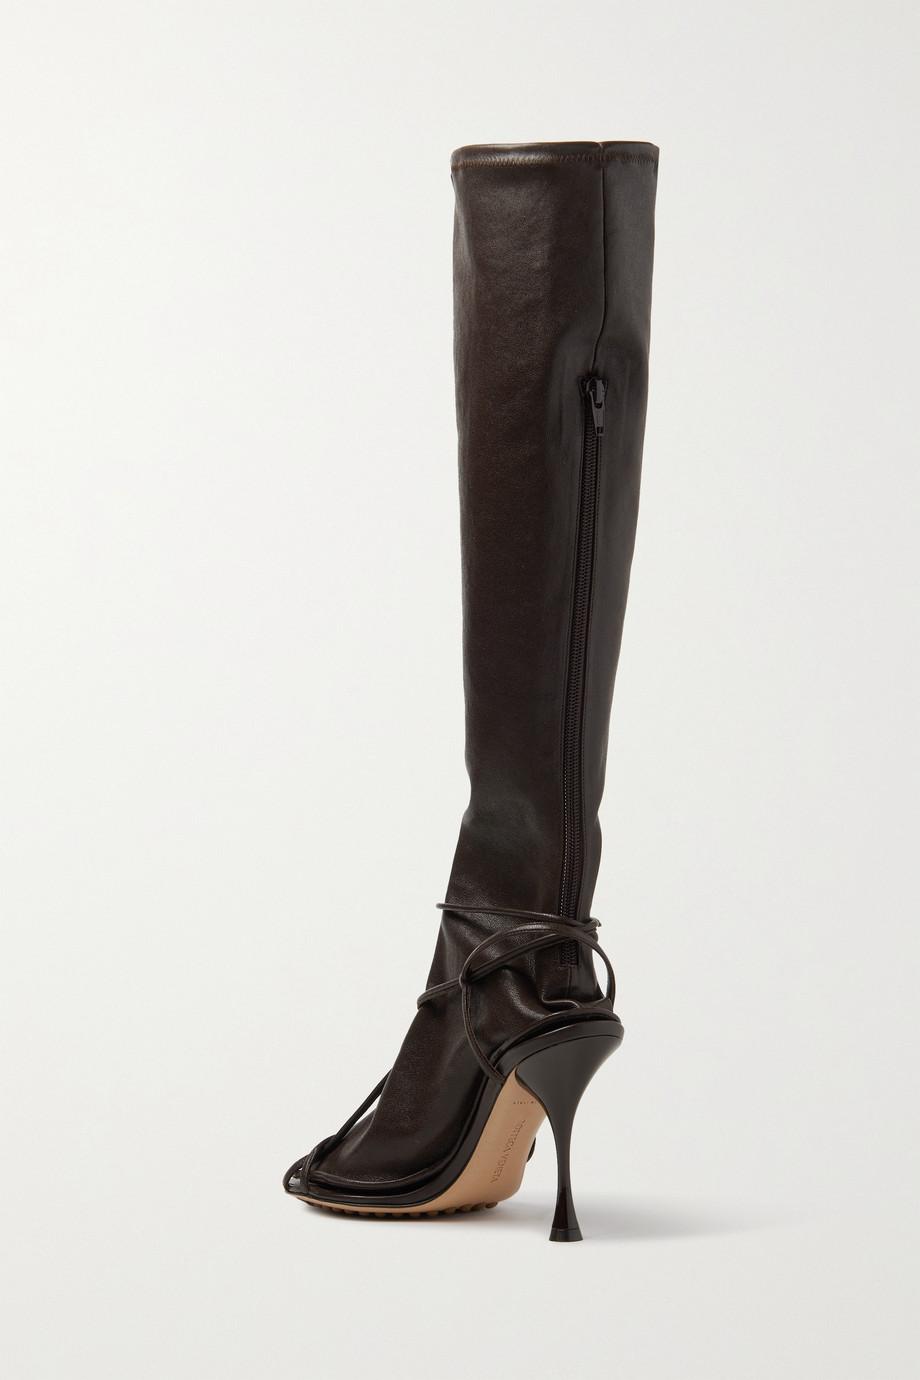 Bottega Veneta Convertible leather knee boots